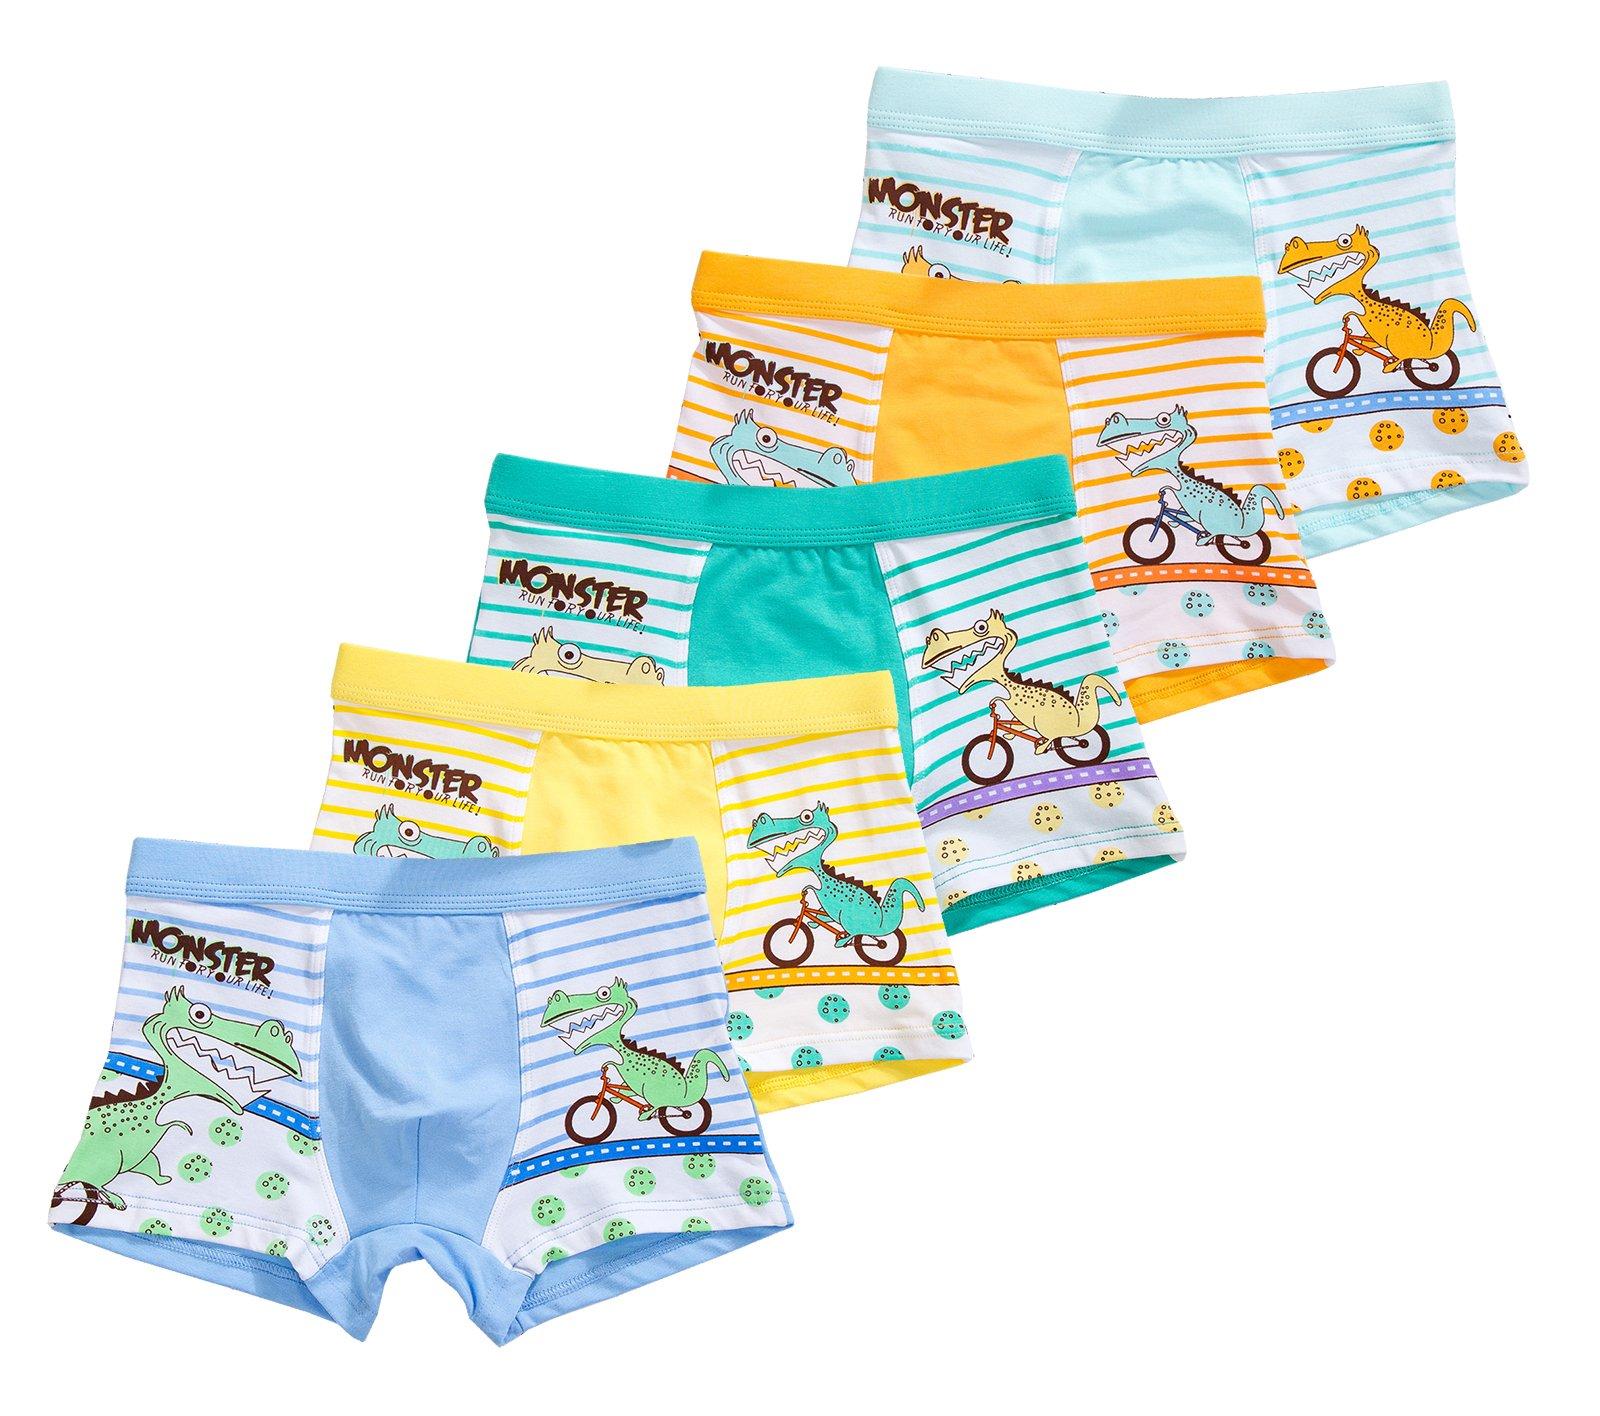 CHUNG Little Big Boys Soft Modal+ Cotton Boxer Briefs Underwear 5 Pack, Dinosaur, 3T